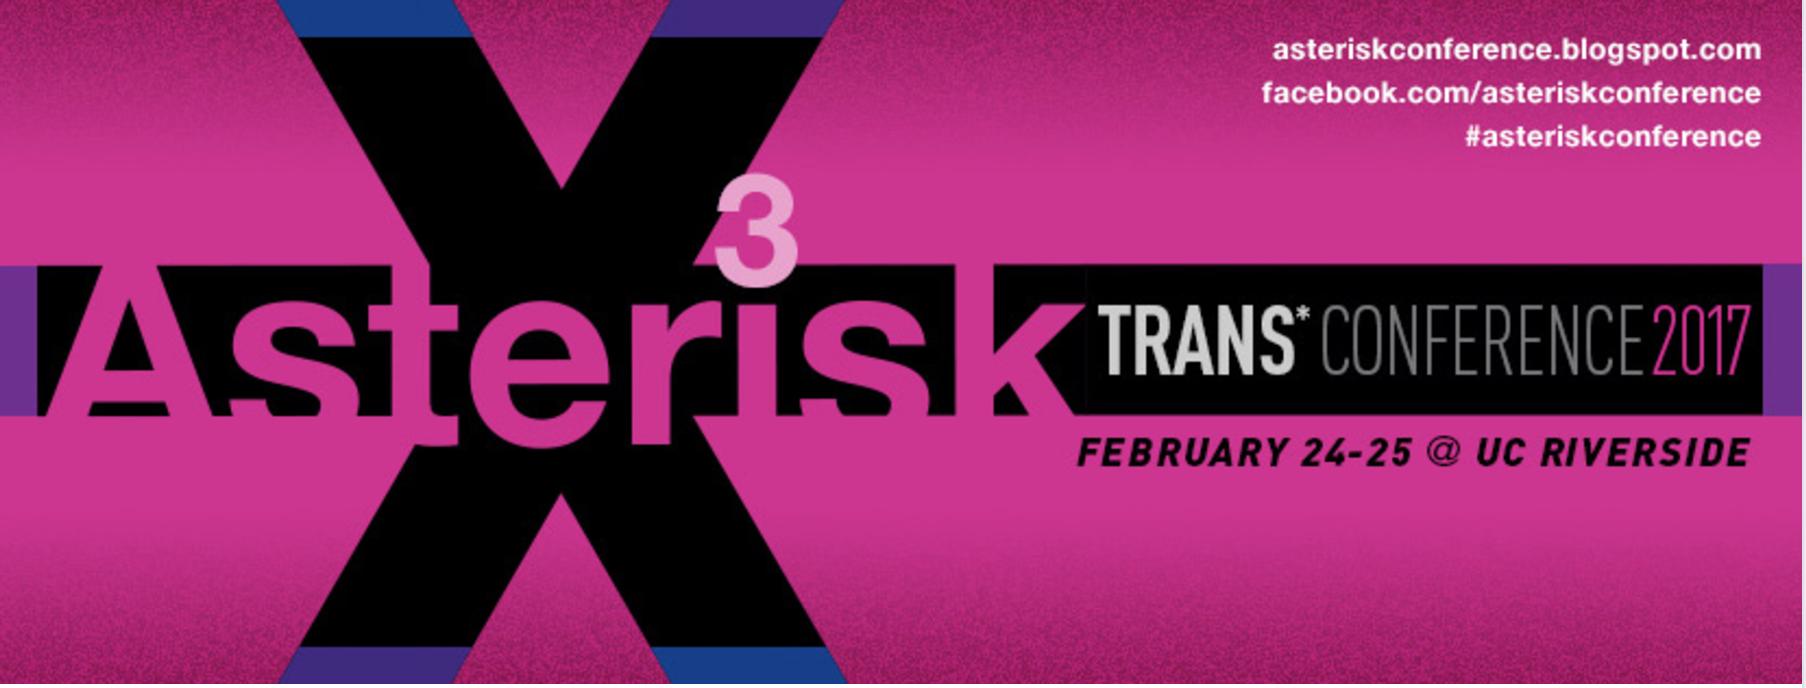 Asterisk Trans* Conference 2017